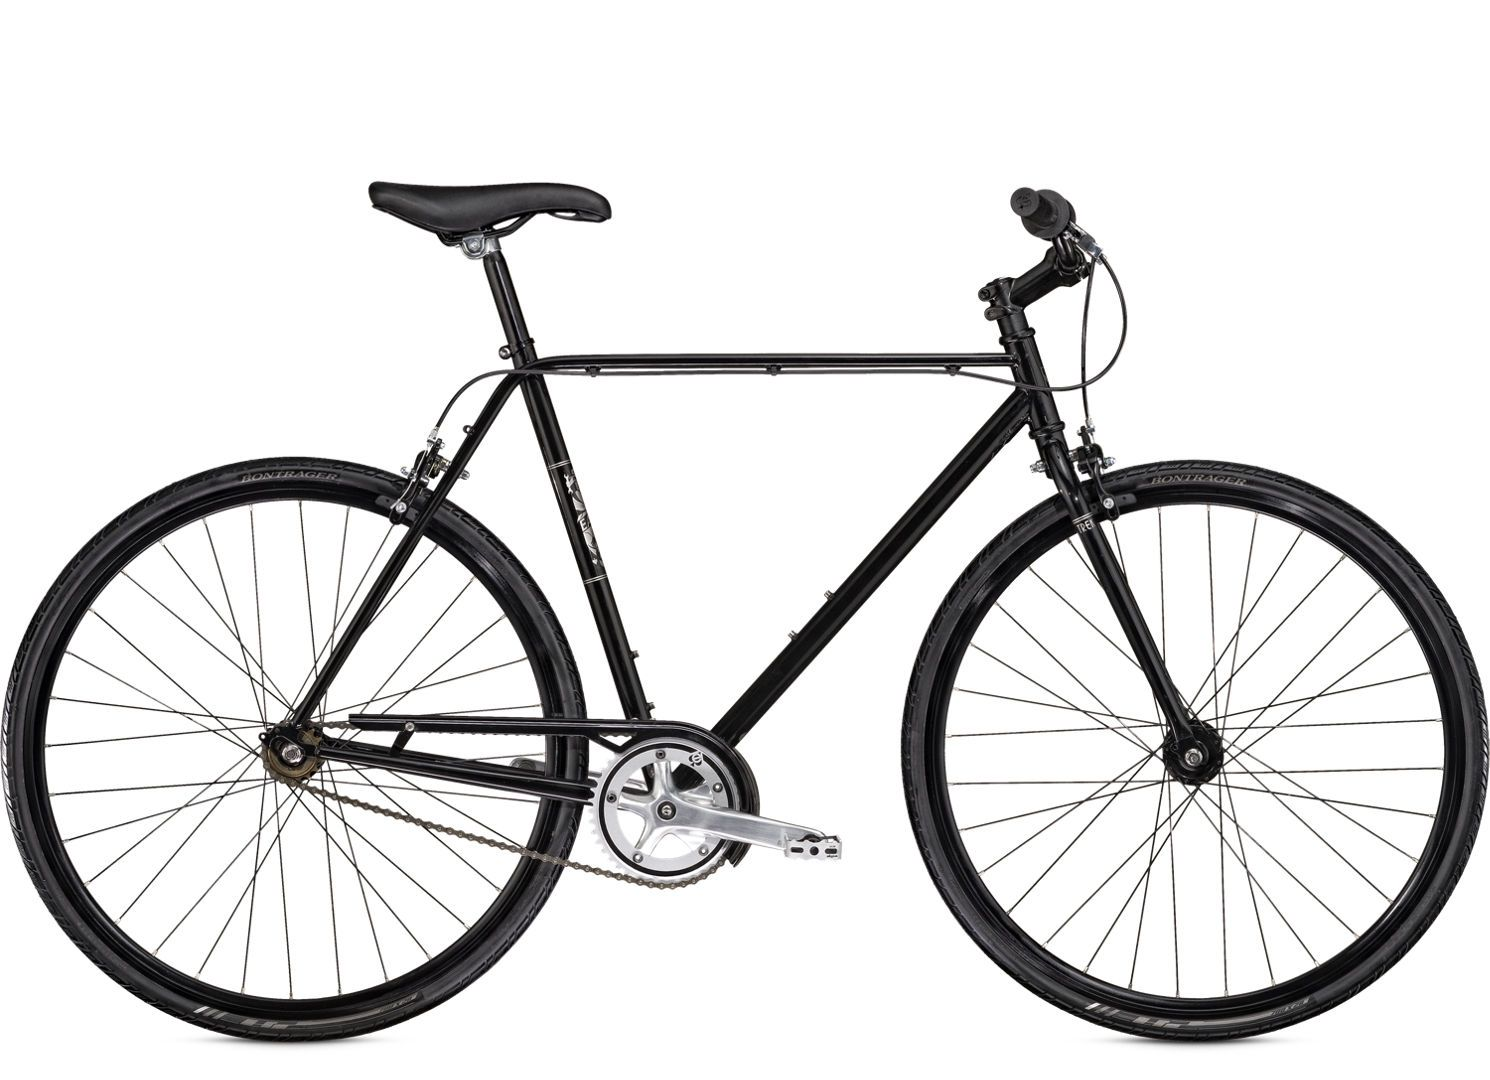 Earl From Trek Http Www Trekbikes Com Us En Bikes Town Urban Utility Earl Earl With Images Trek Bicycle Commuter Bike Trek Mountain Bike